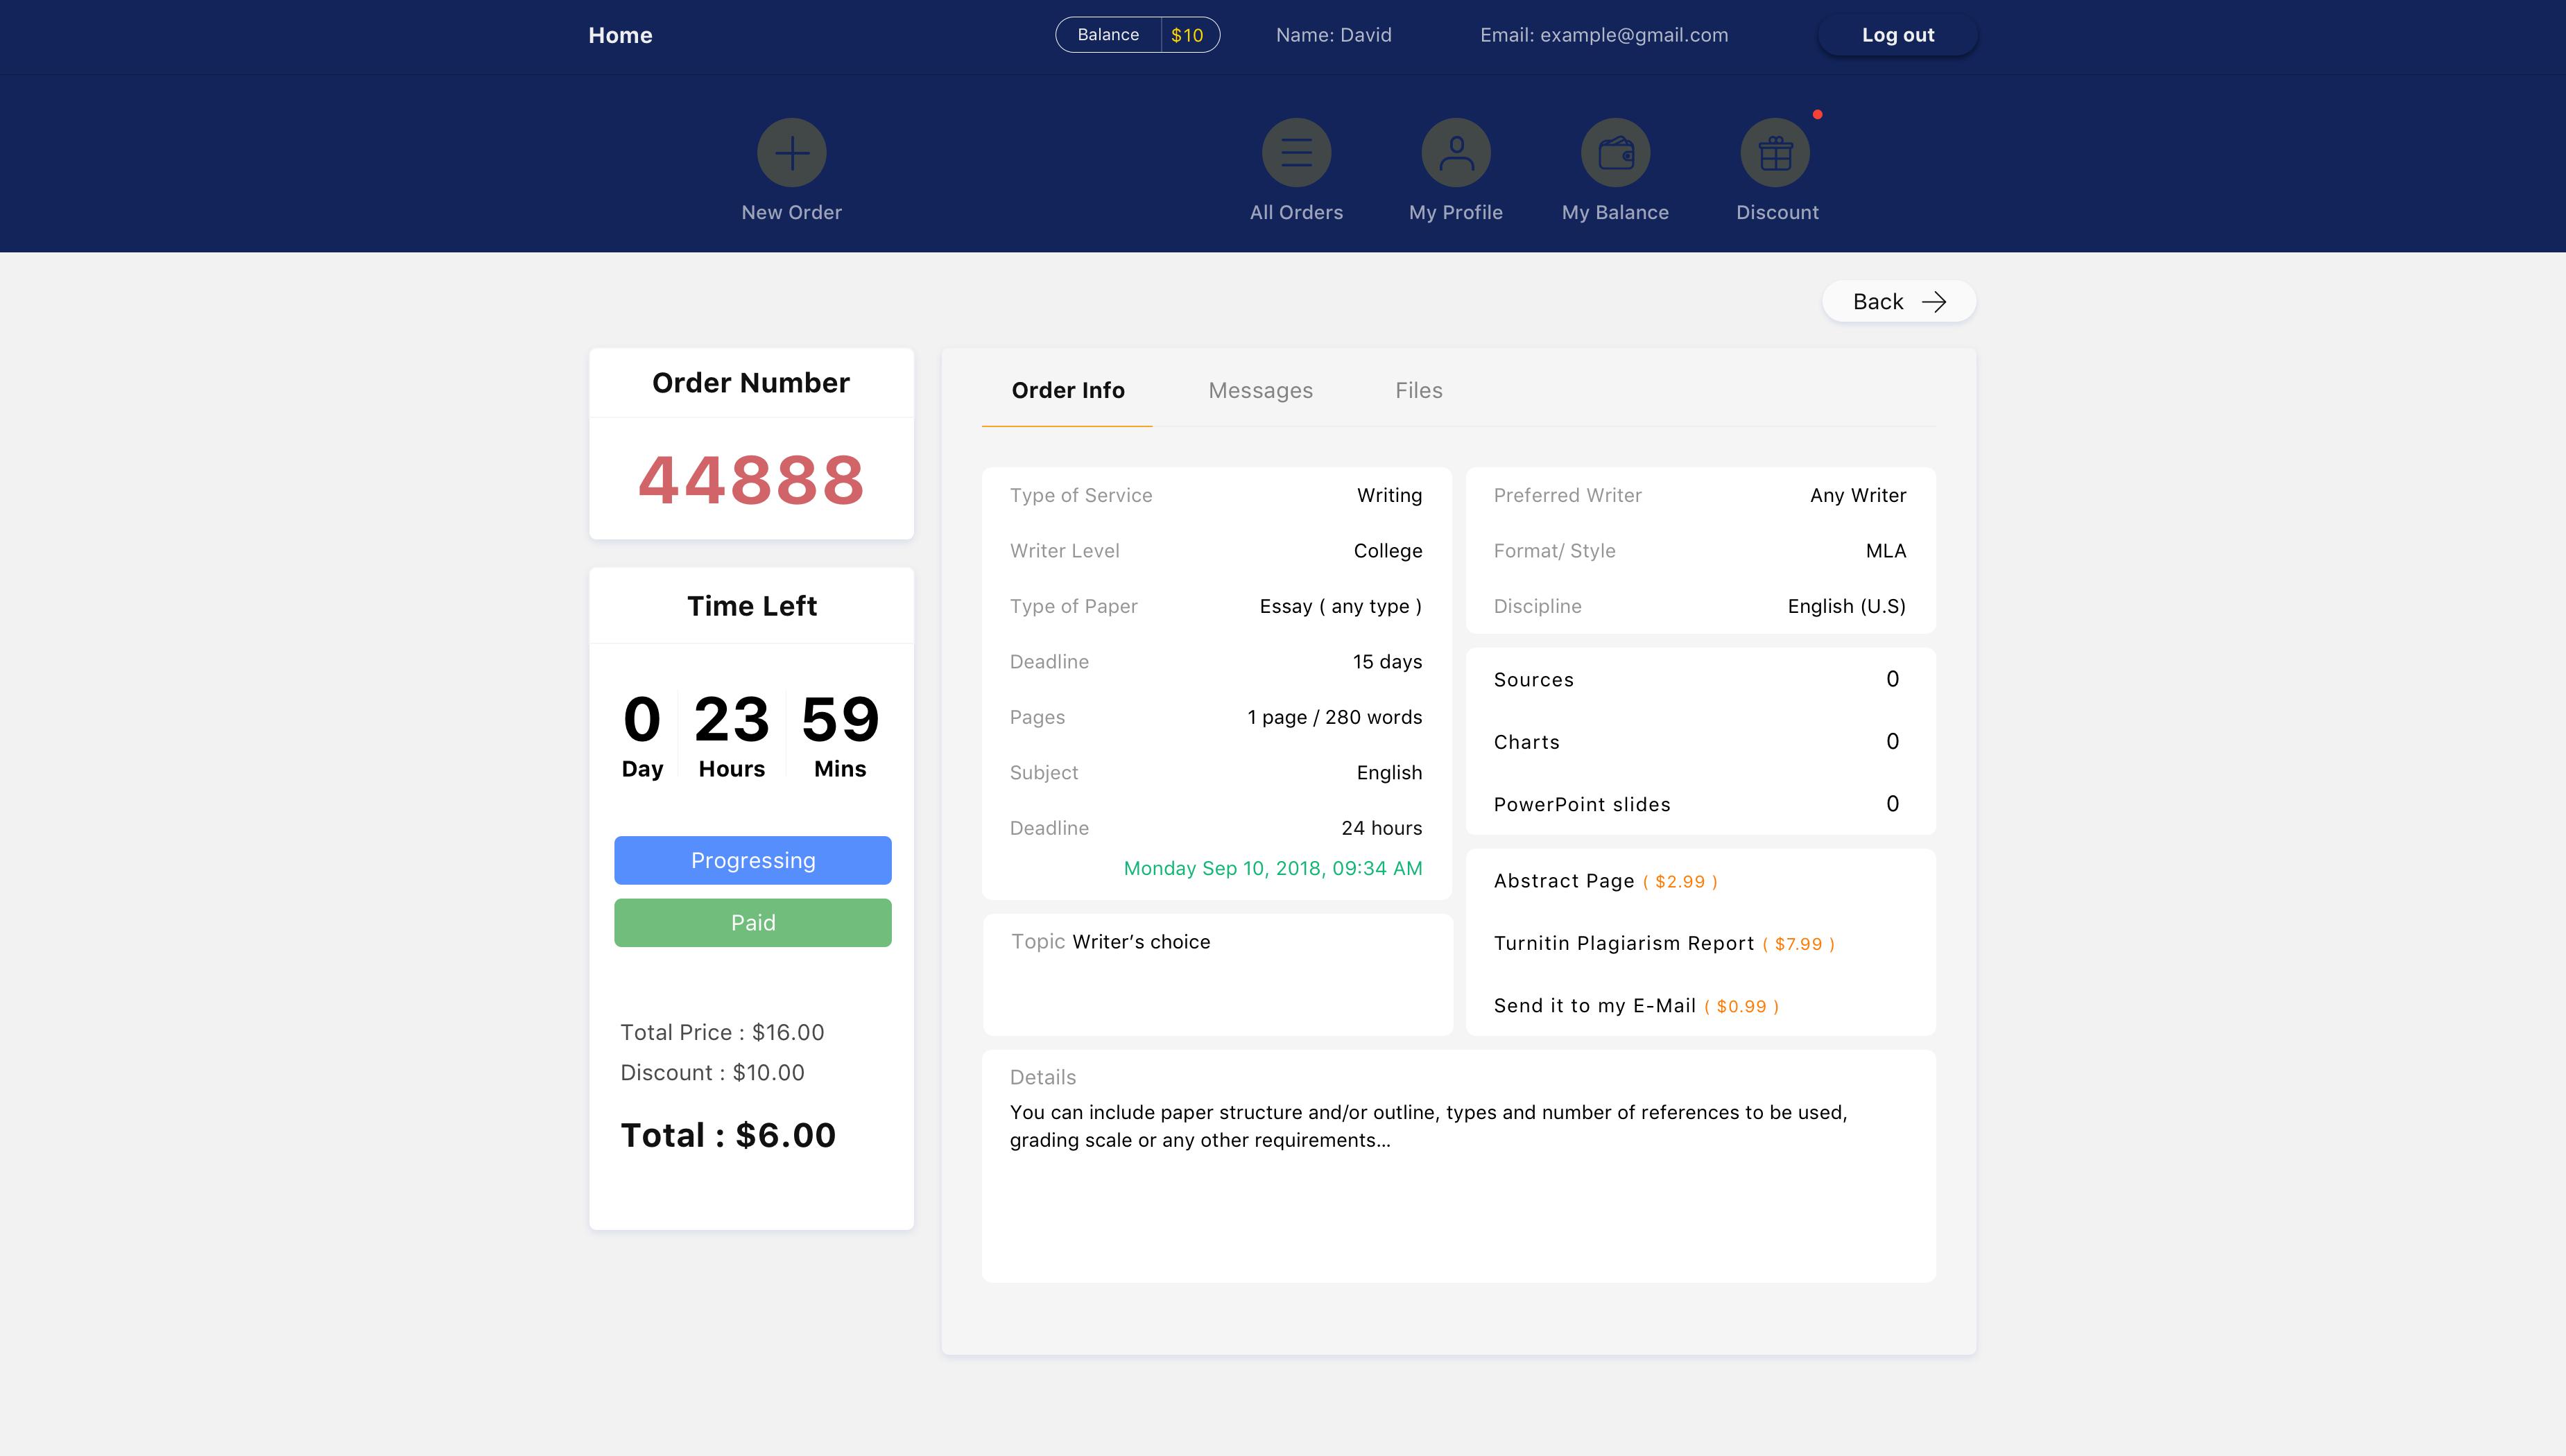 Order Progress